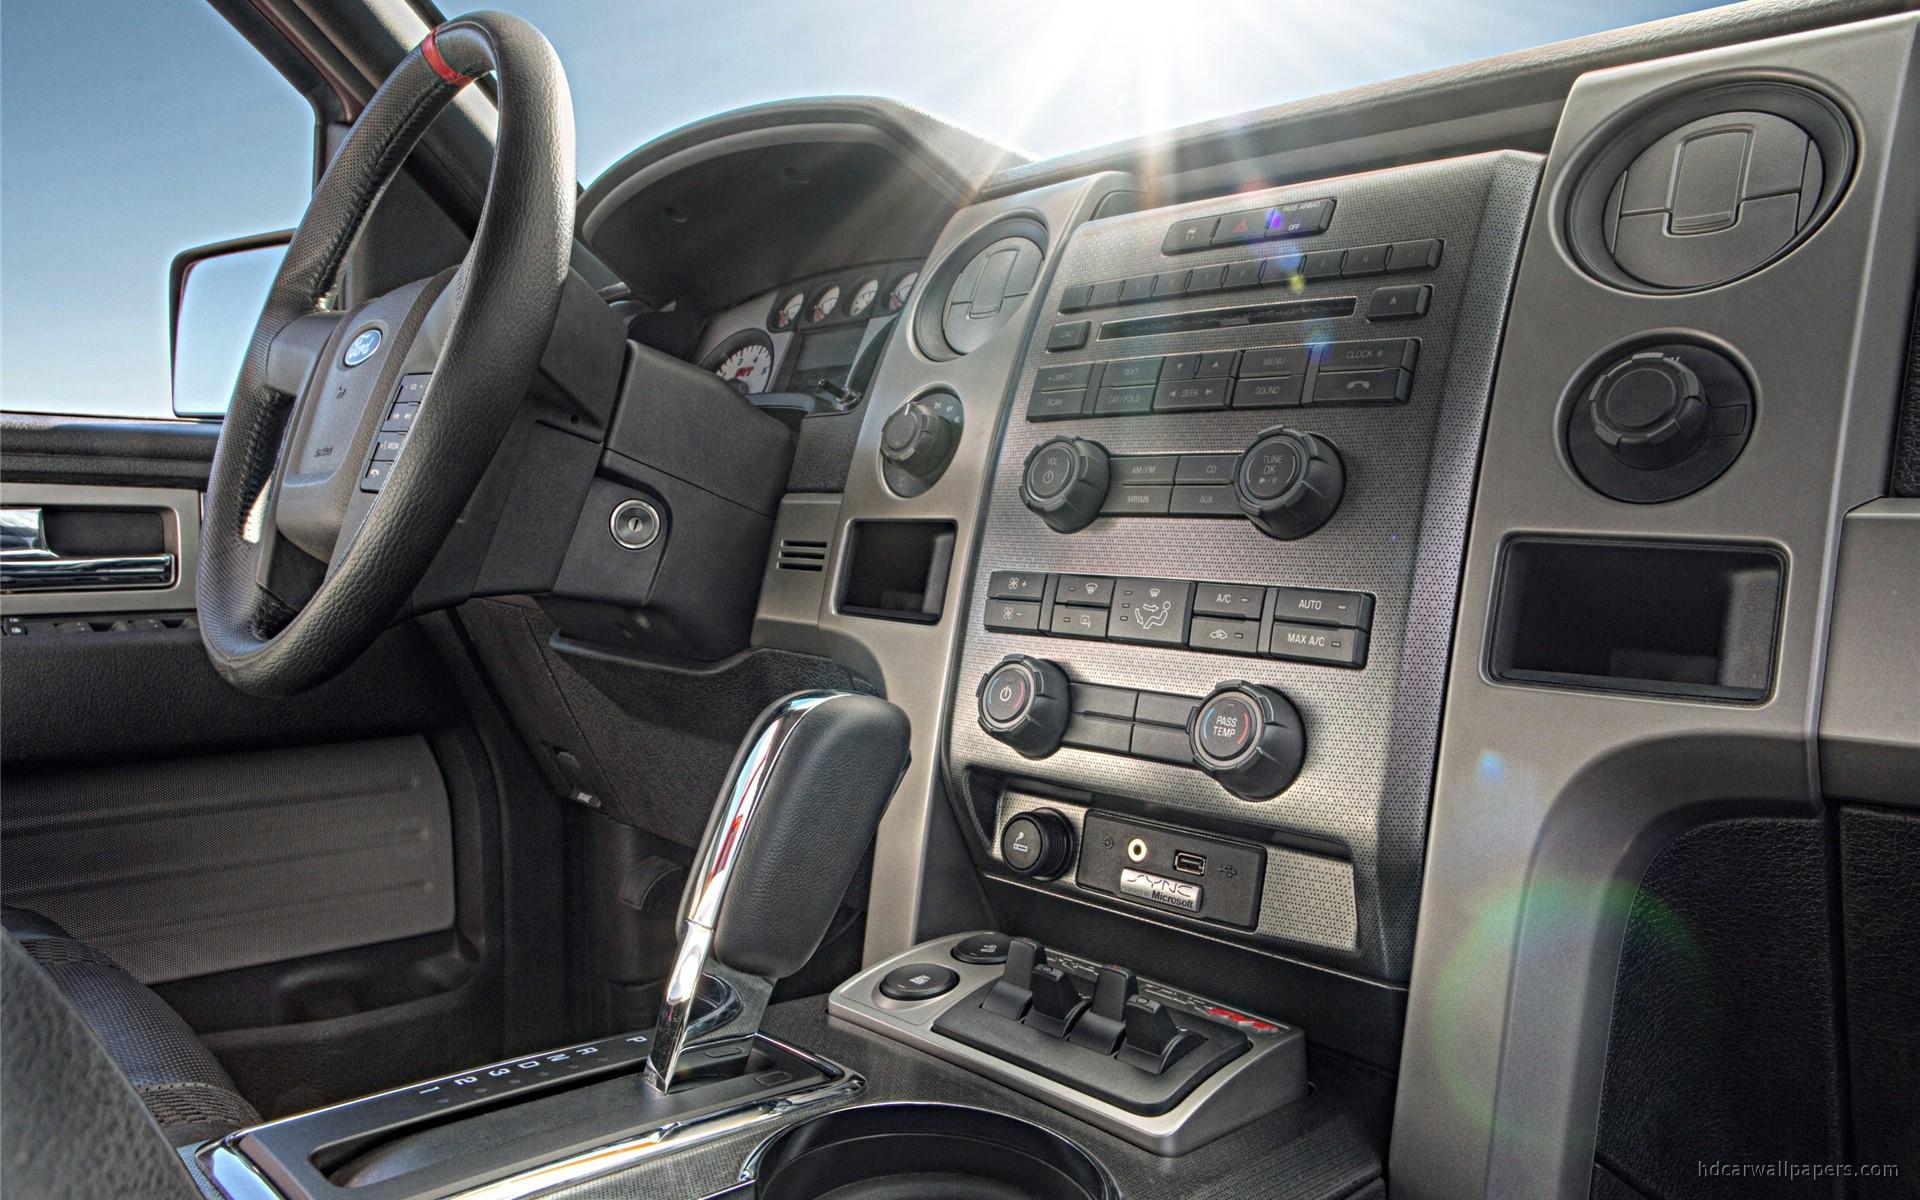 2010 Ford F150 SVT Raptor Interior Wallpaper  HD Car Wallpapers